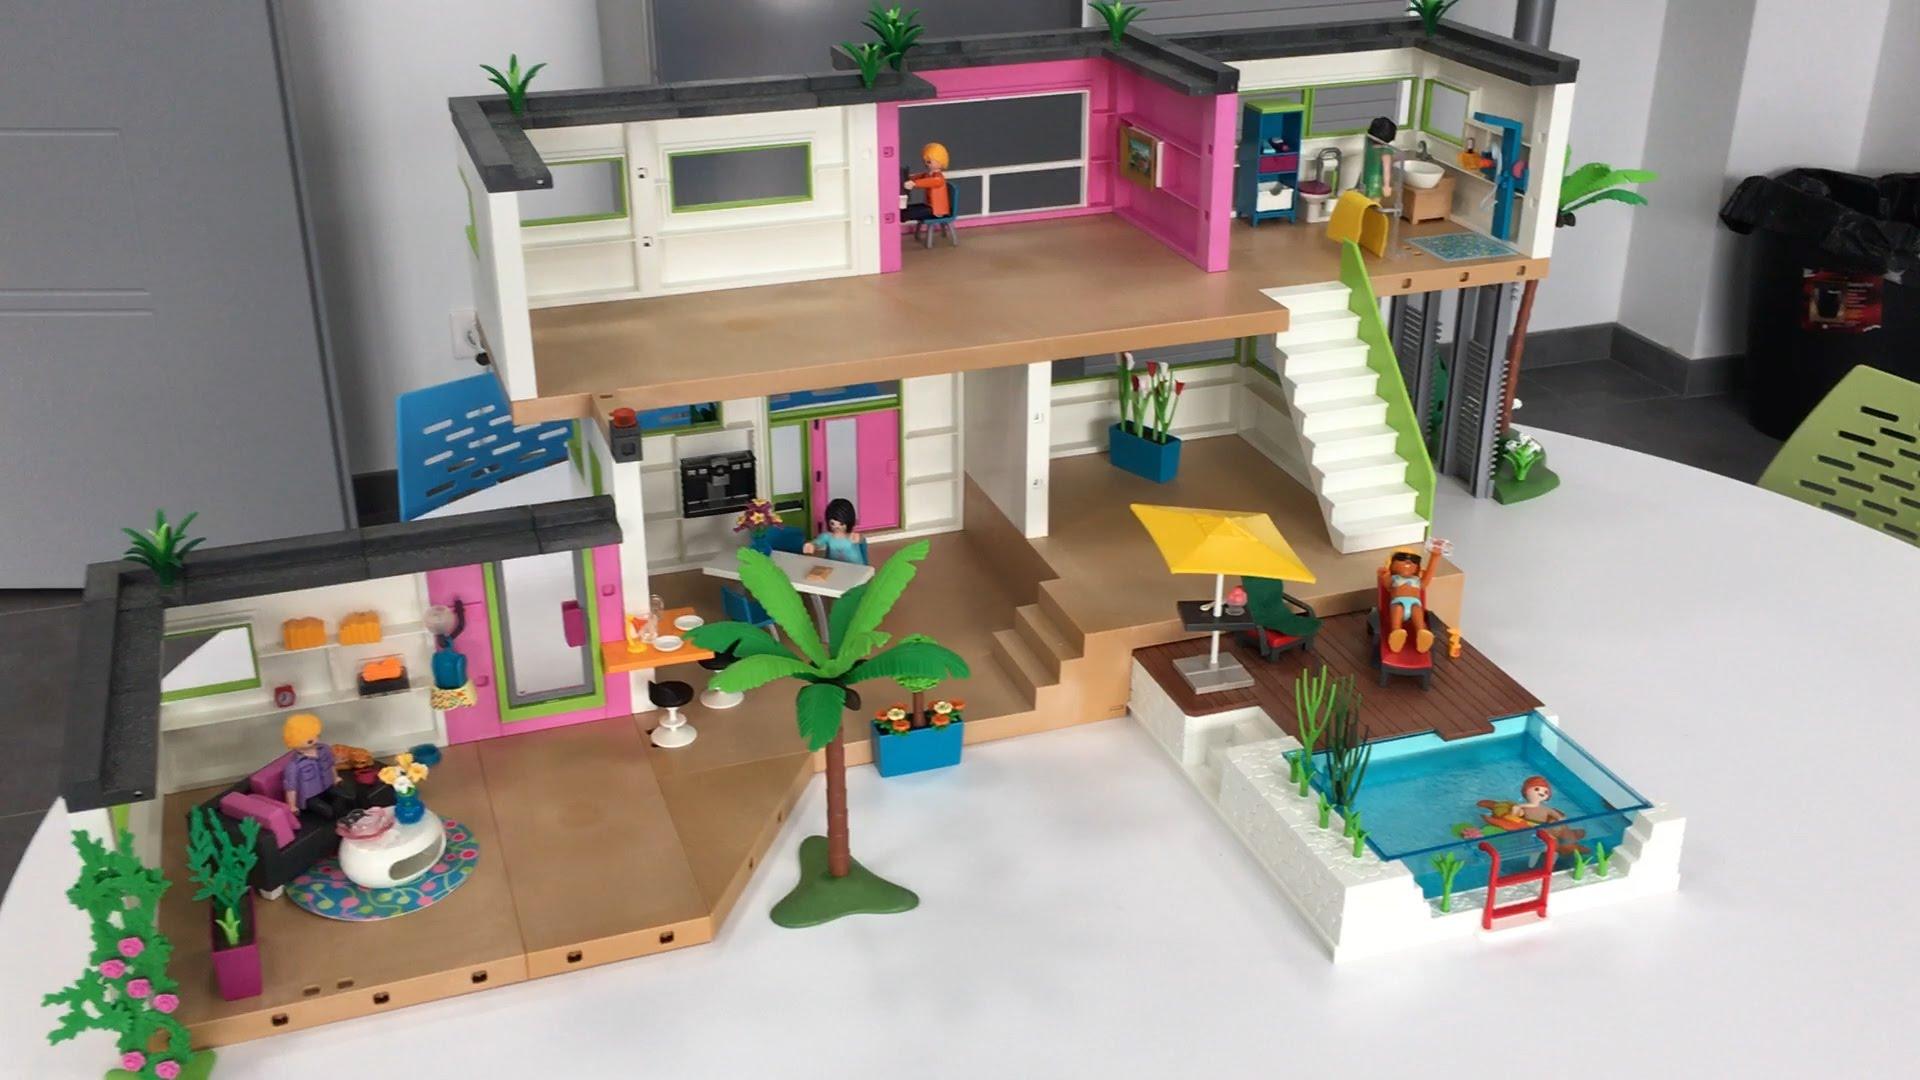 Playmobil maison de luxe en francais - stepindance.fr